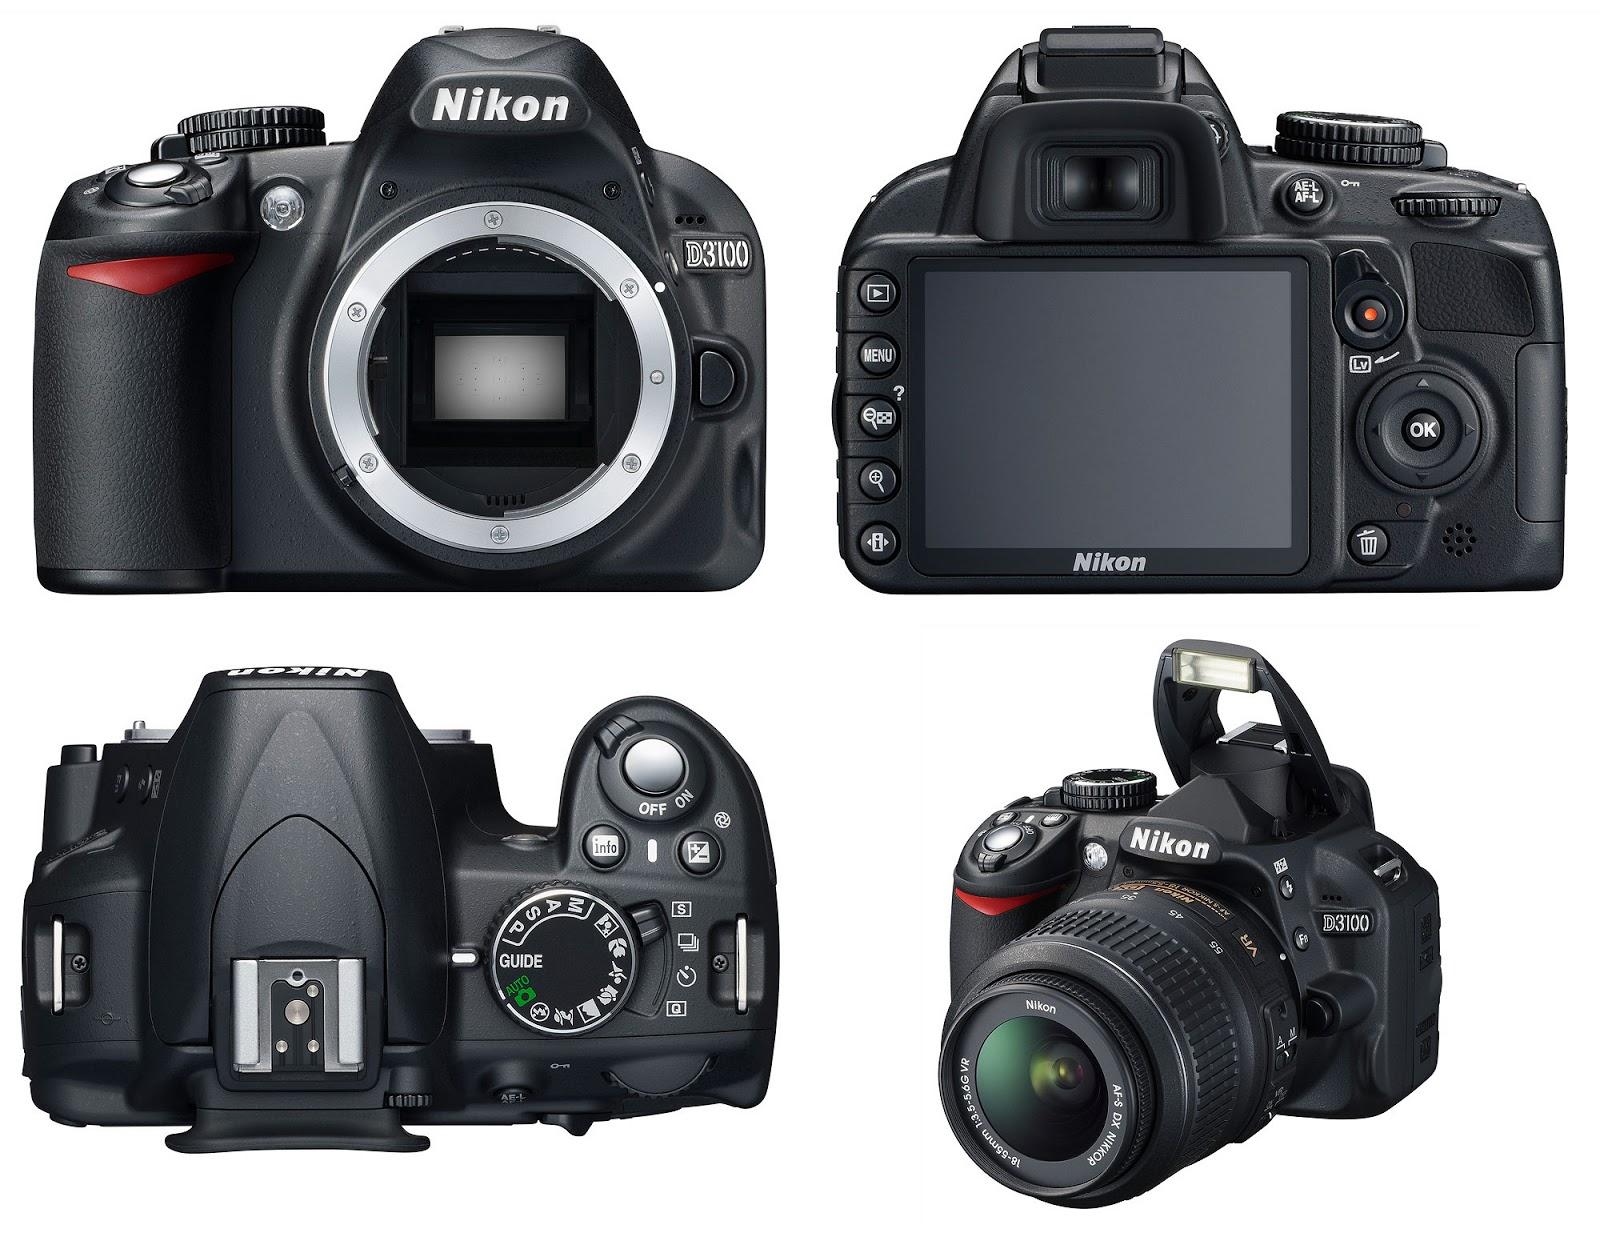 Camera Dslr Camera For Video Recording best dslr cameras for video recording home design nikon d3100 camera